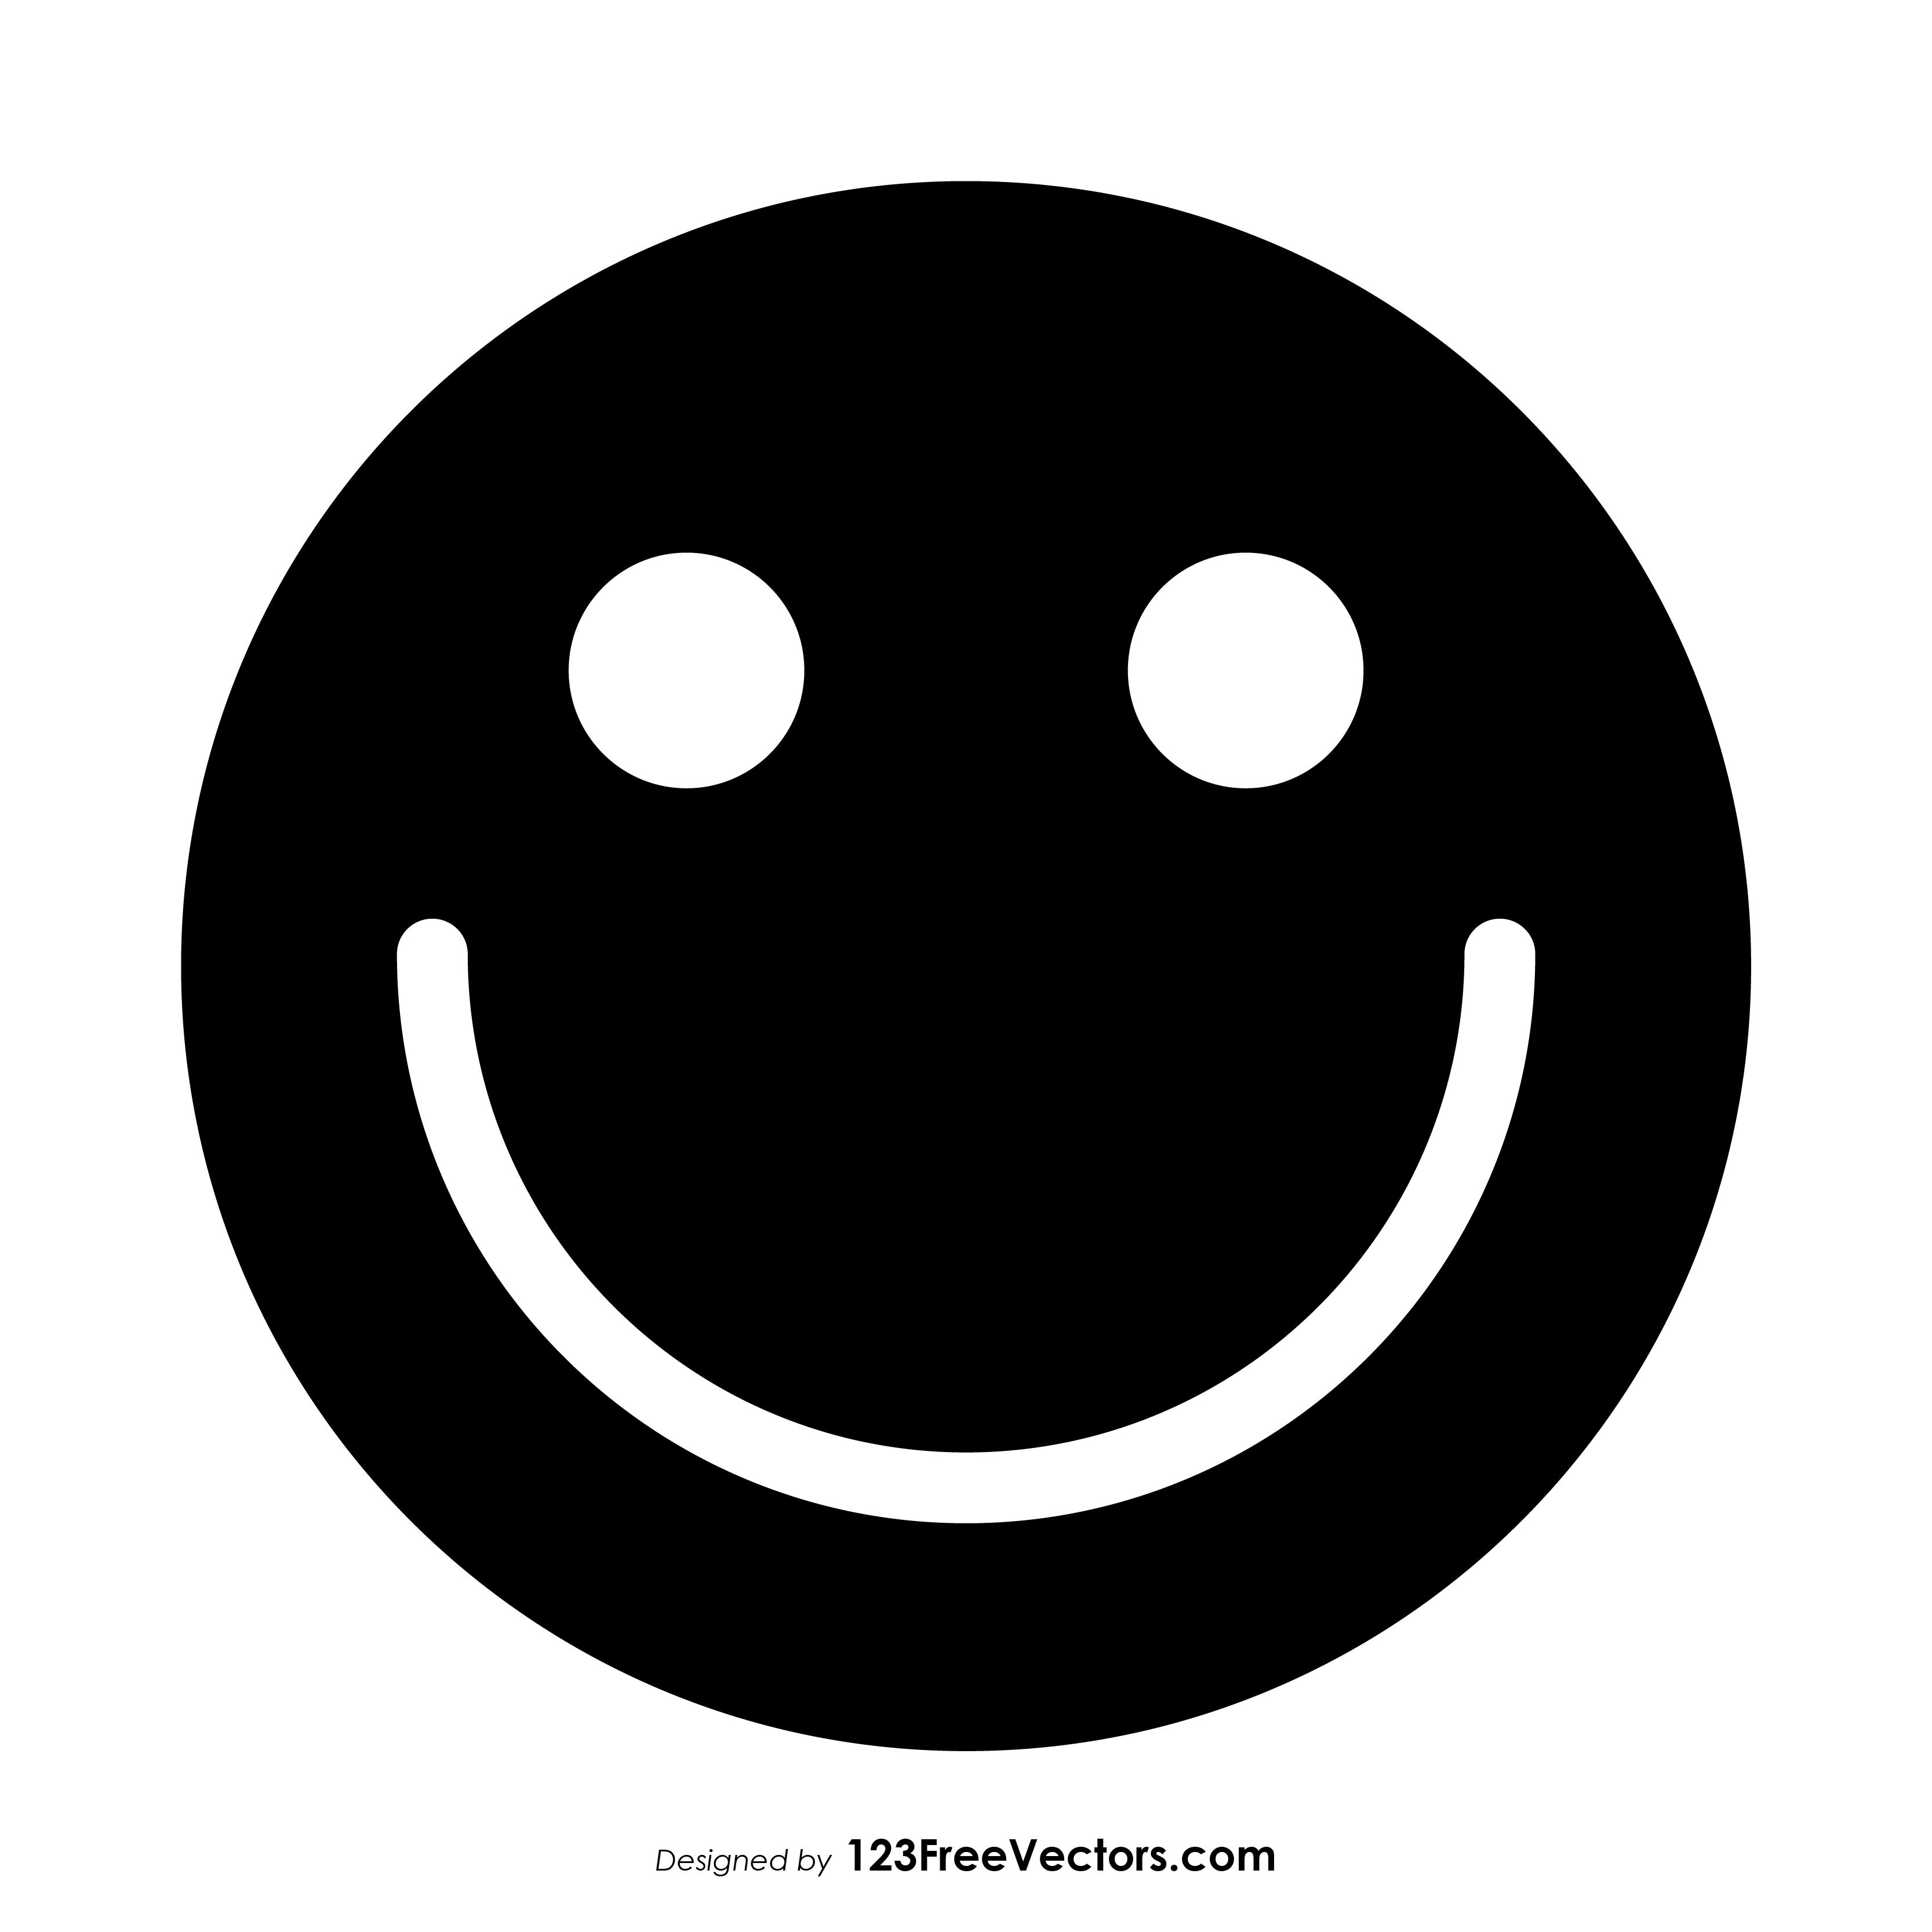 Black Smiley Face Symbol 123freevectors